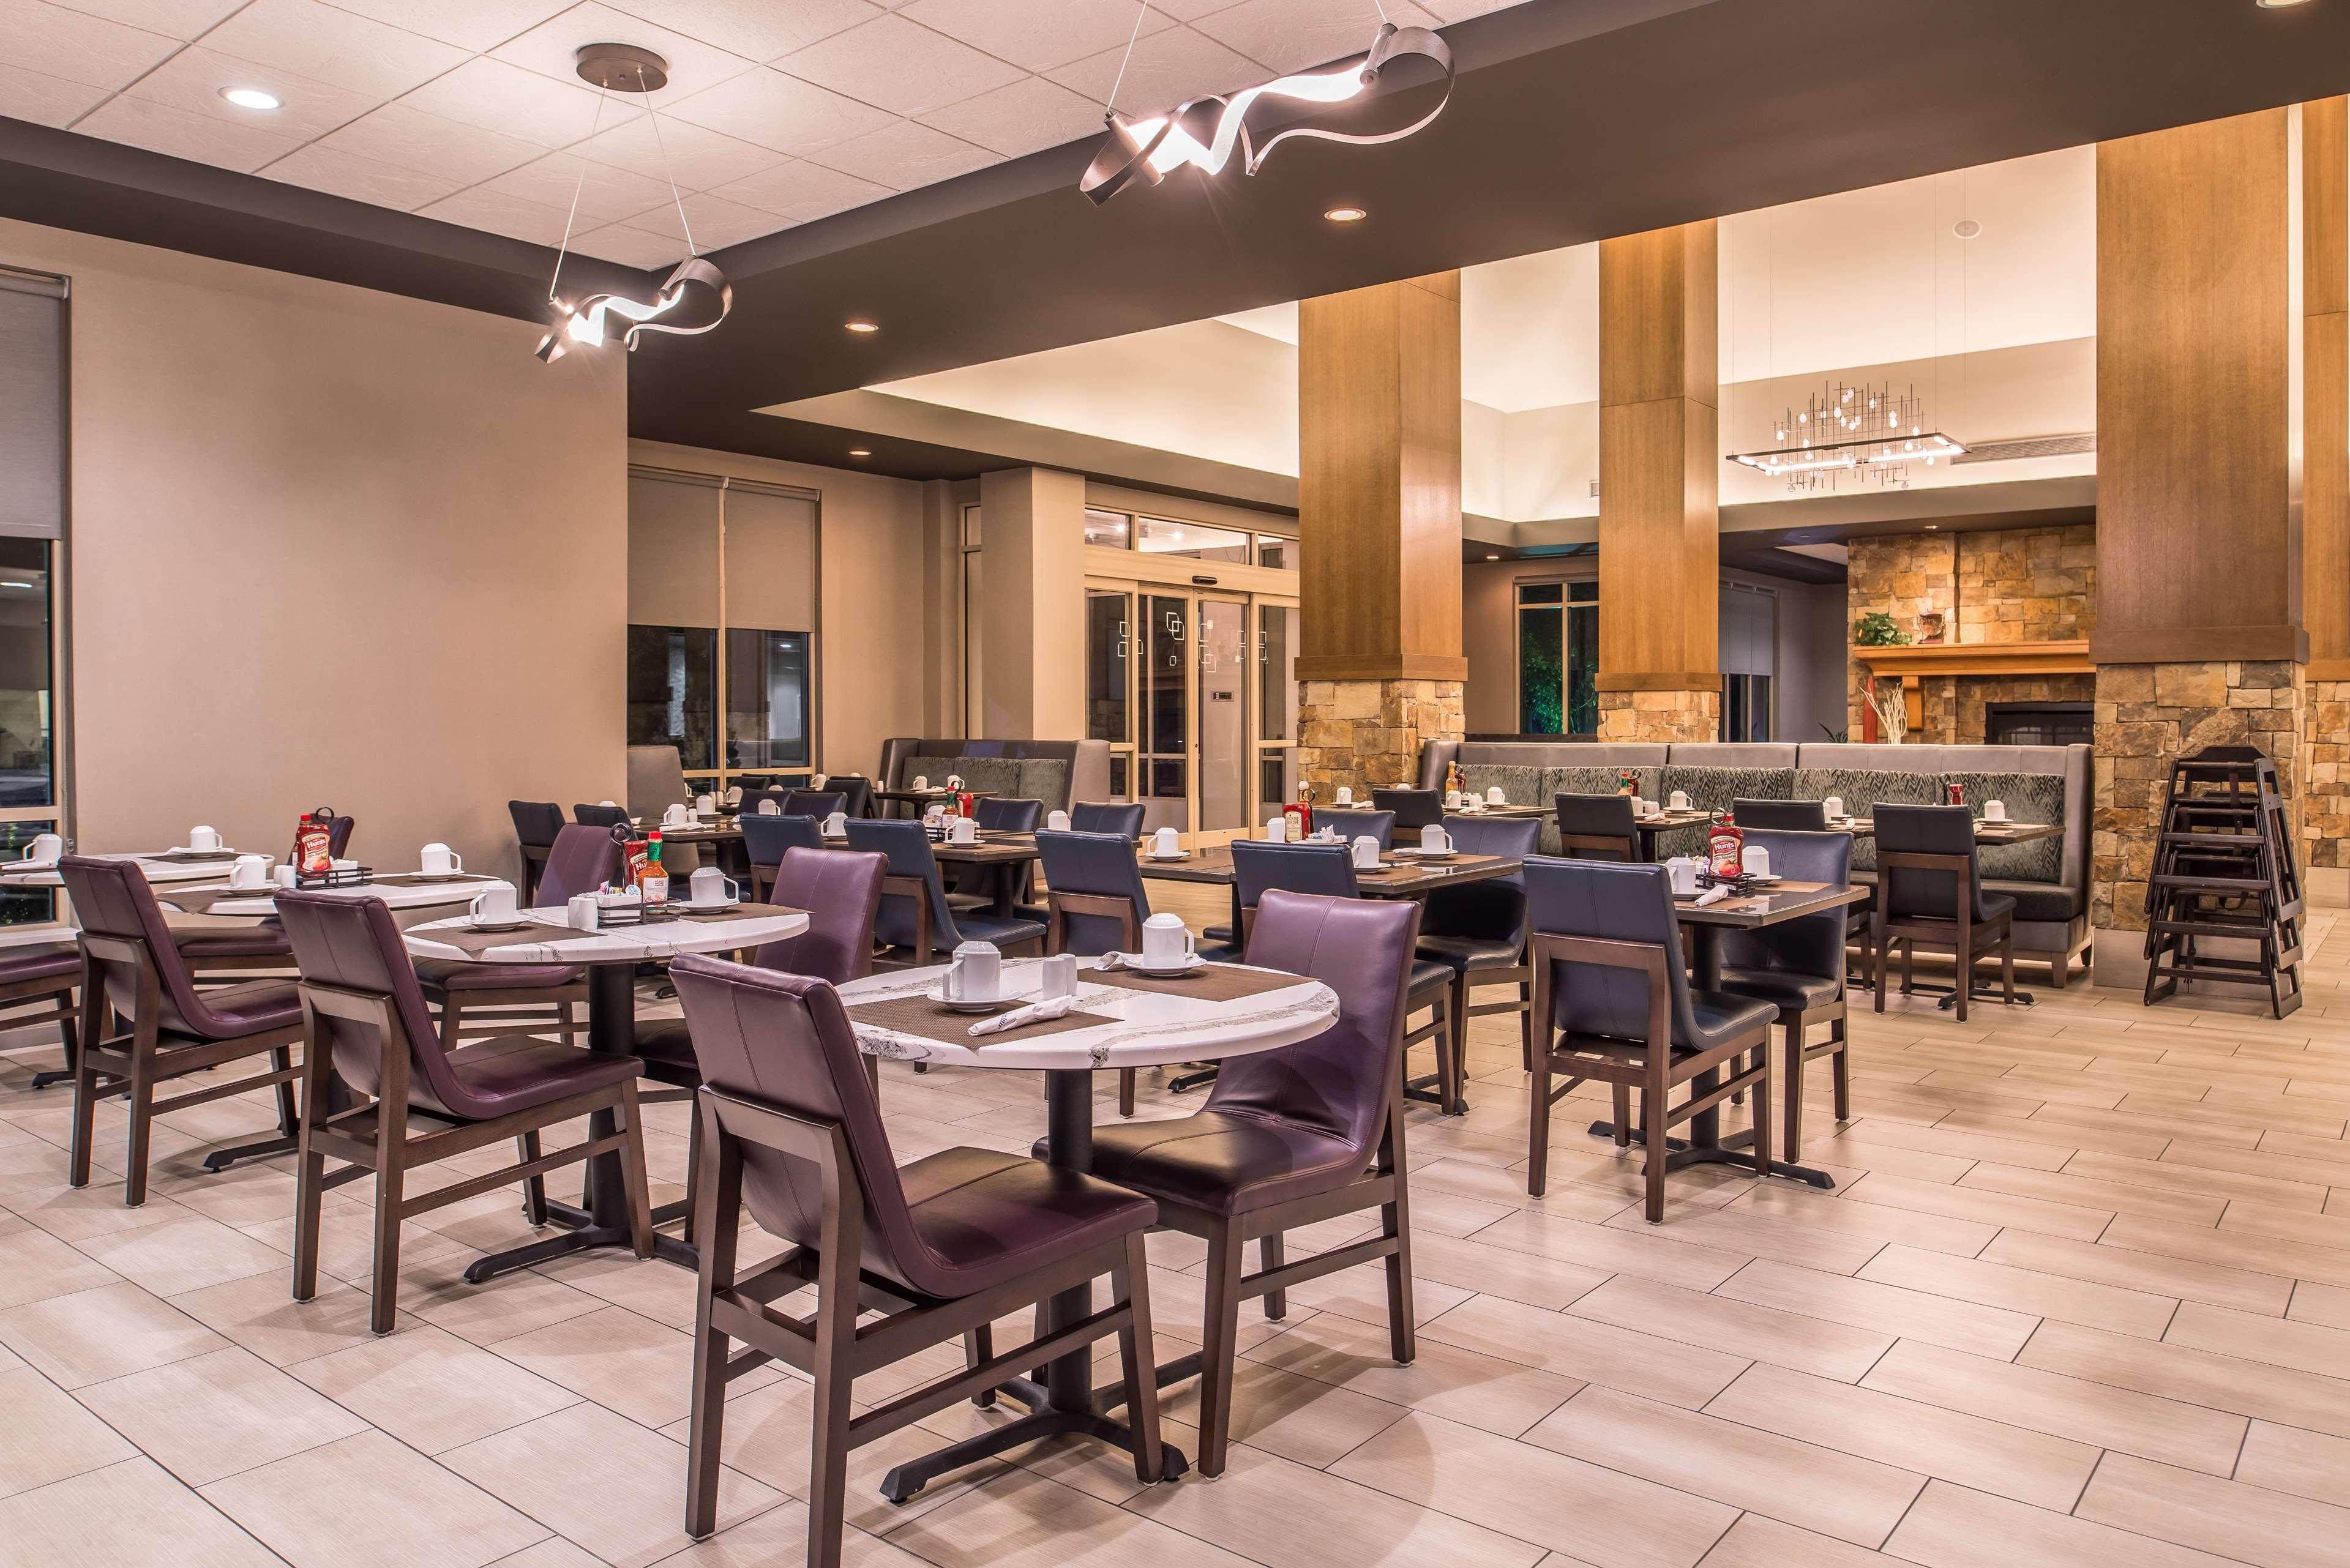 Hilton Garden Inn Salt Lake City Downtown image 21